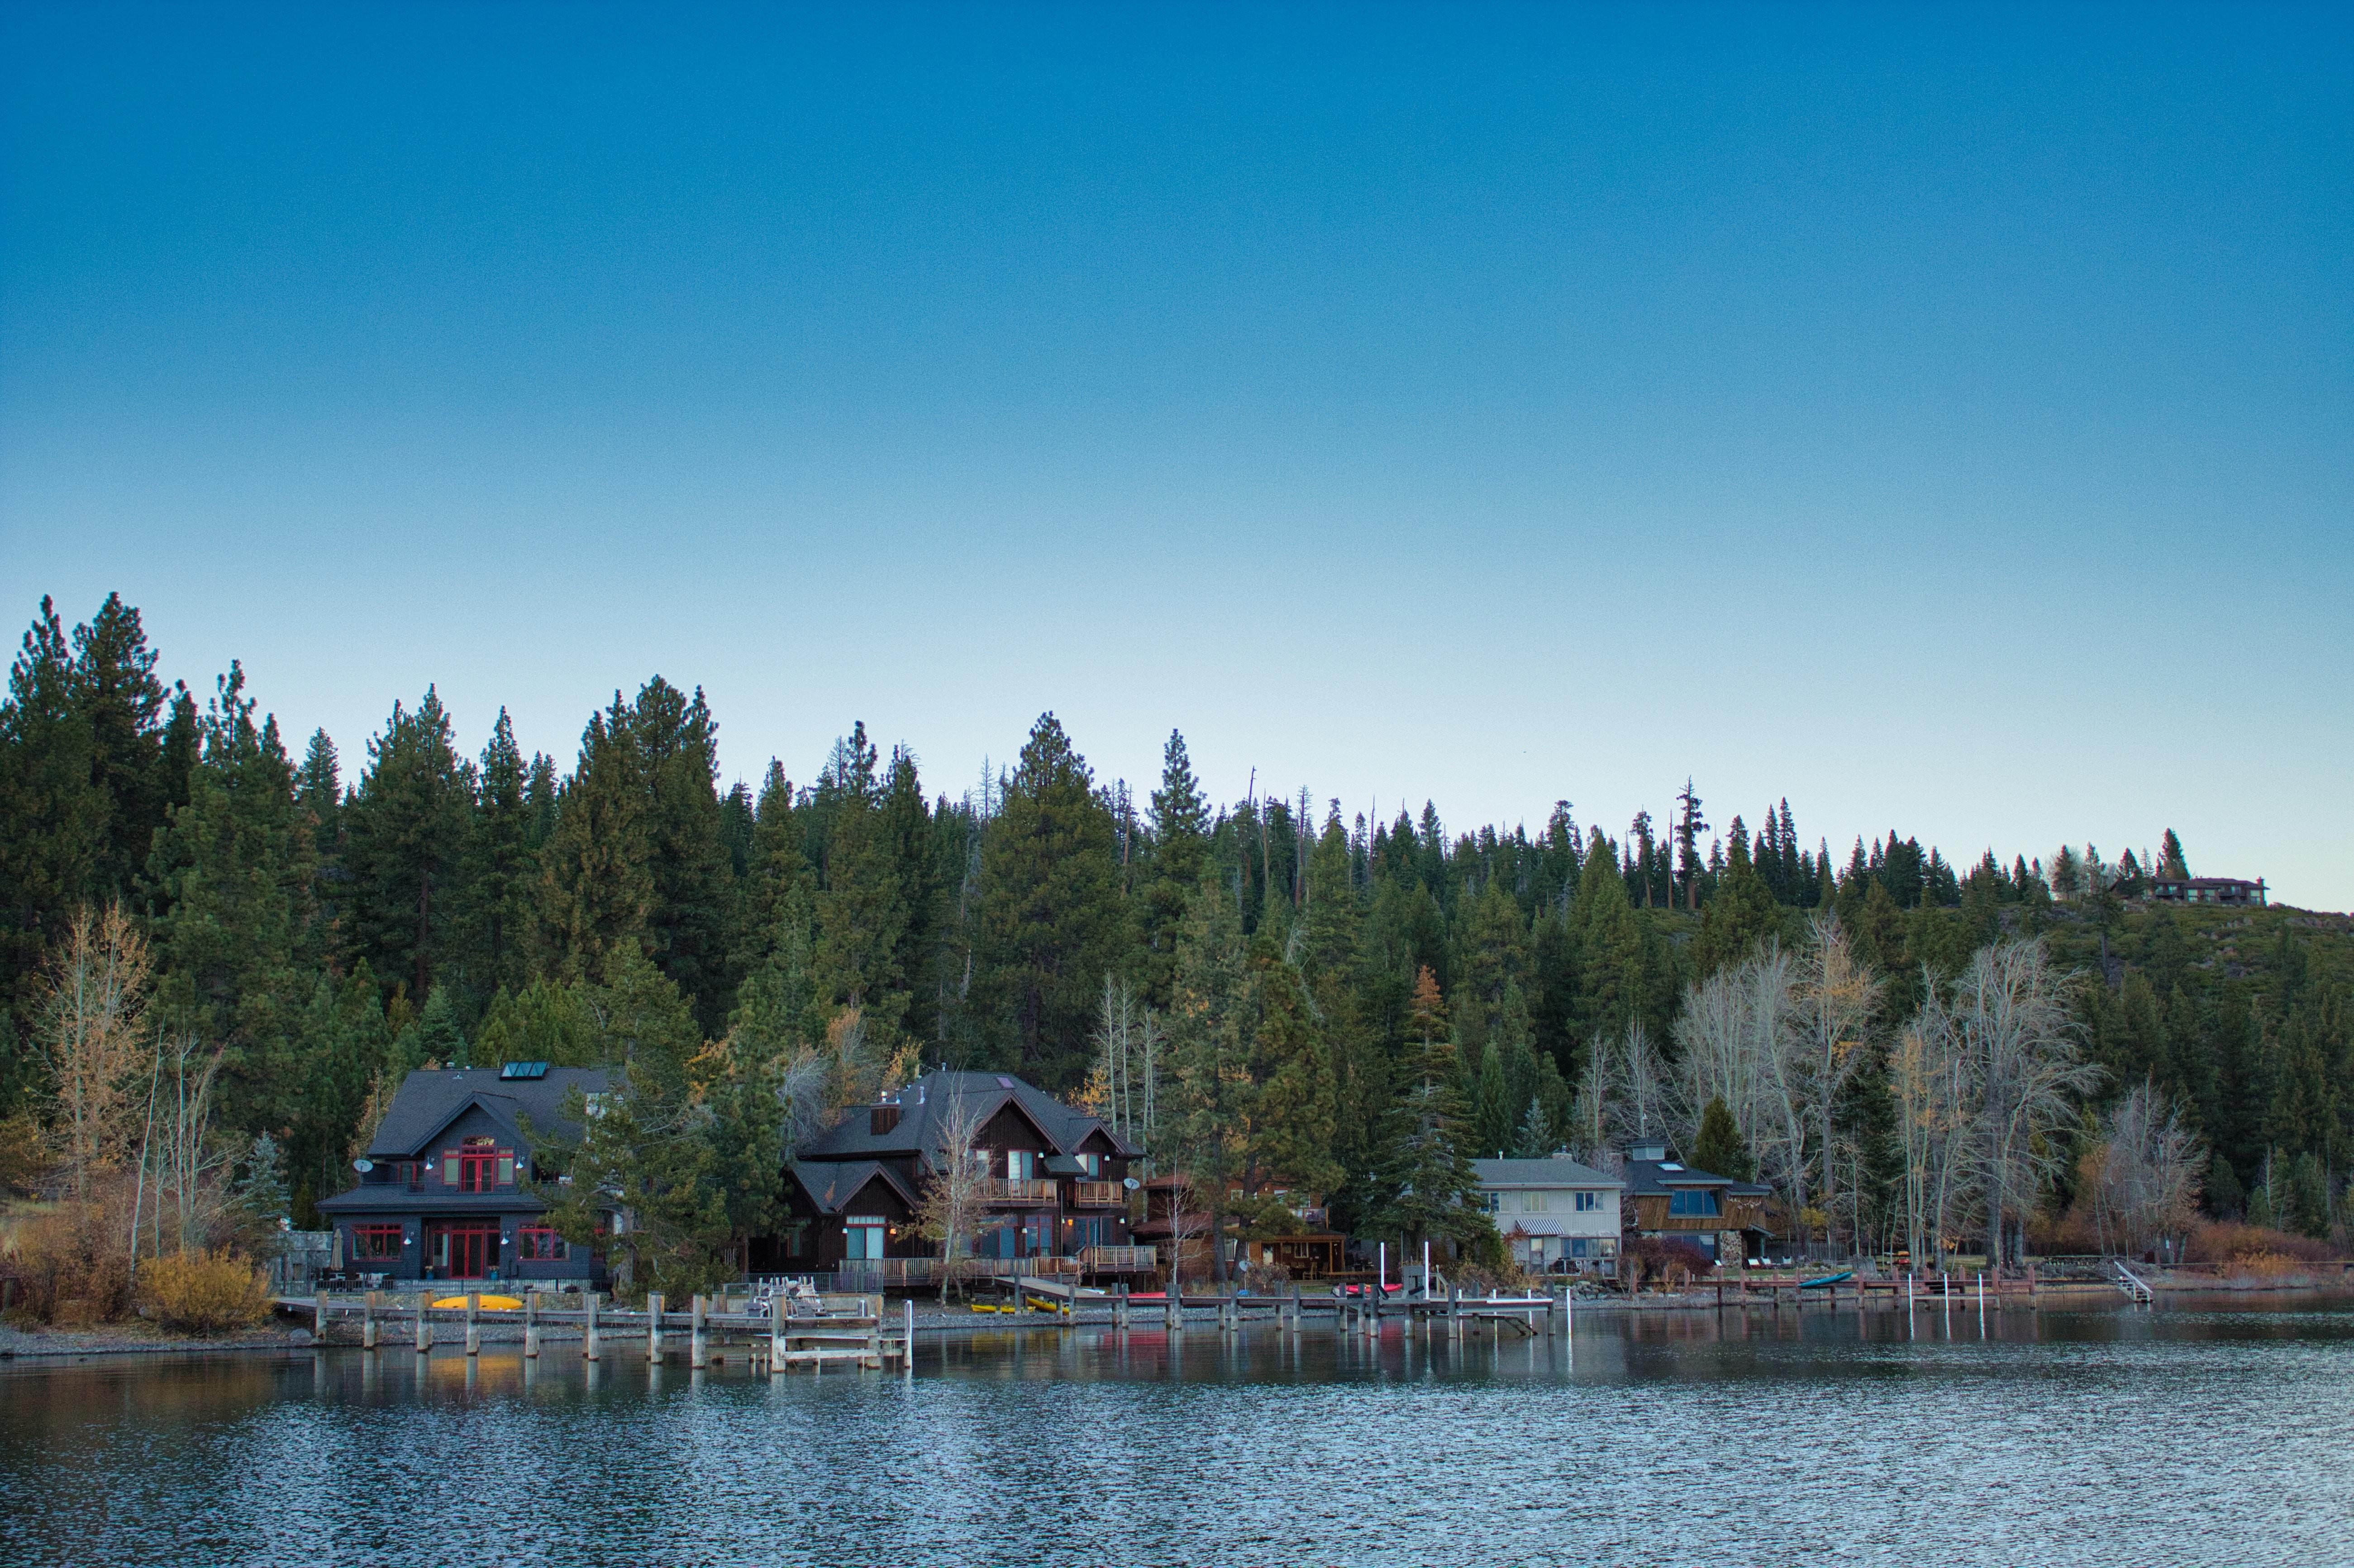 Carnelian Bay Lake Tahoe Shoreline